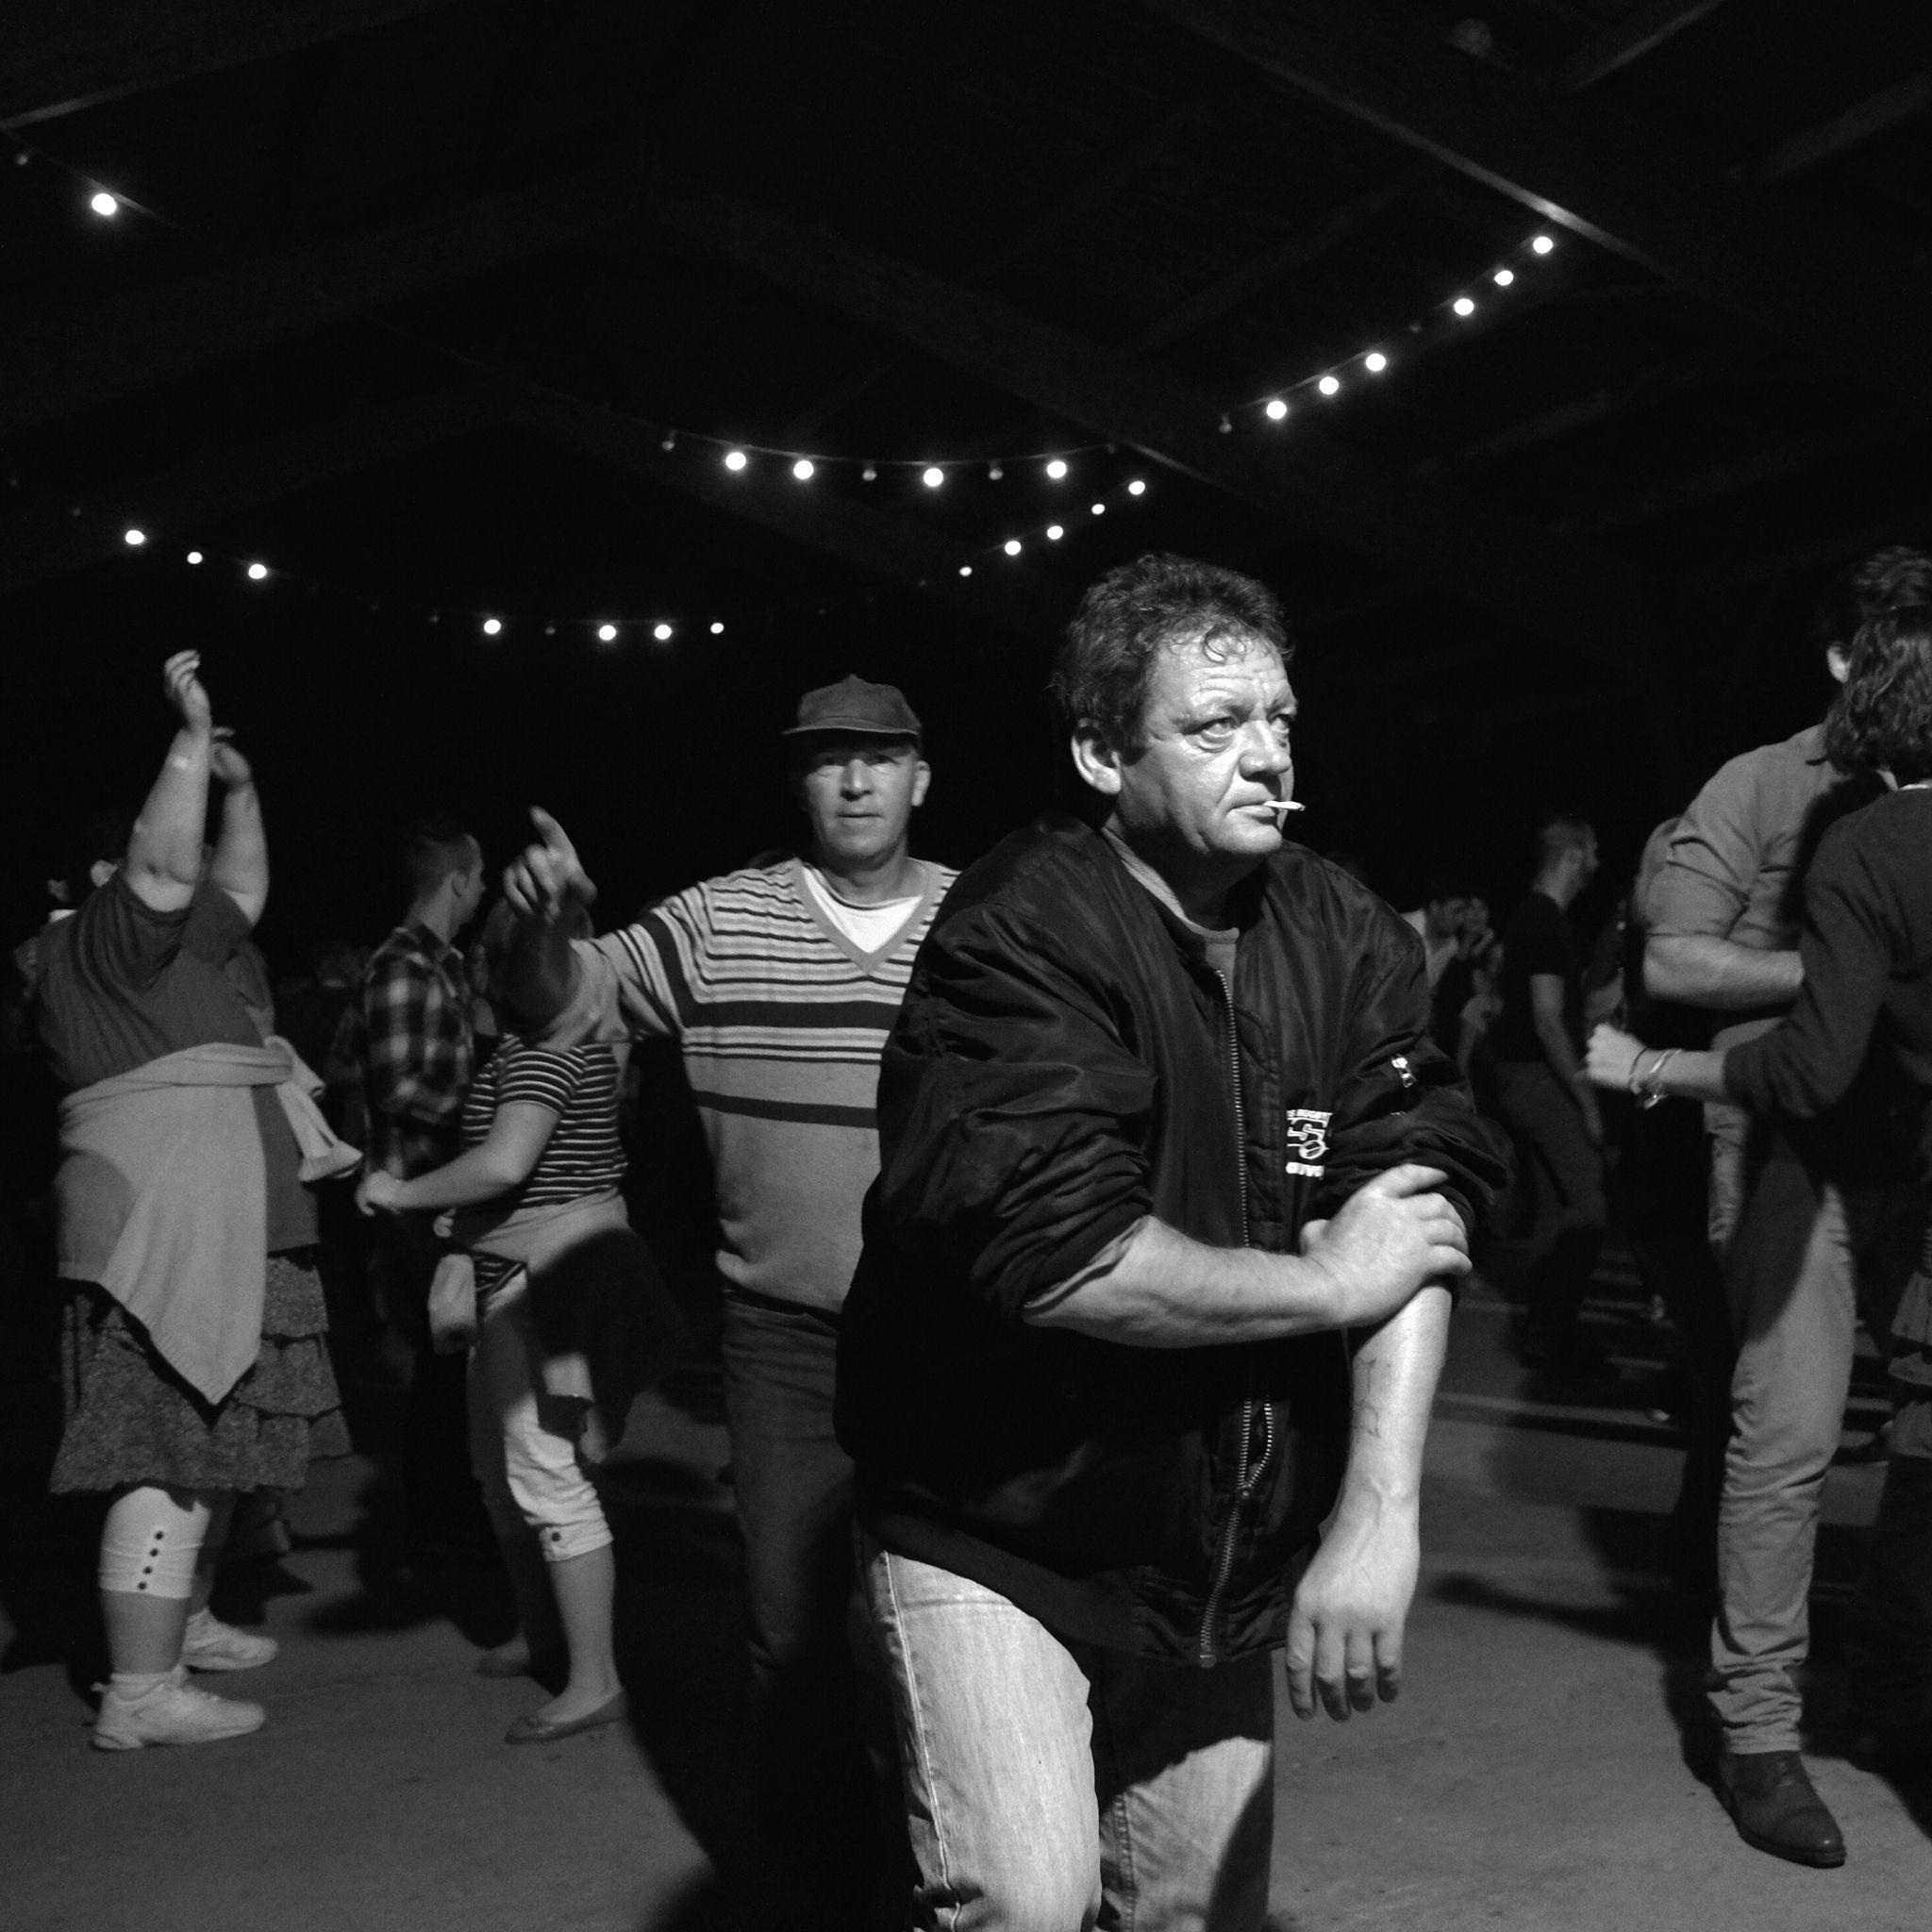 #b&w #dance #france #reportage